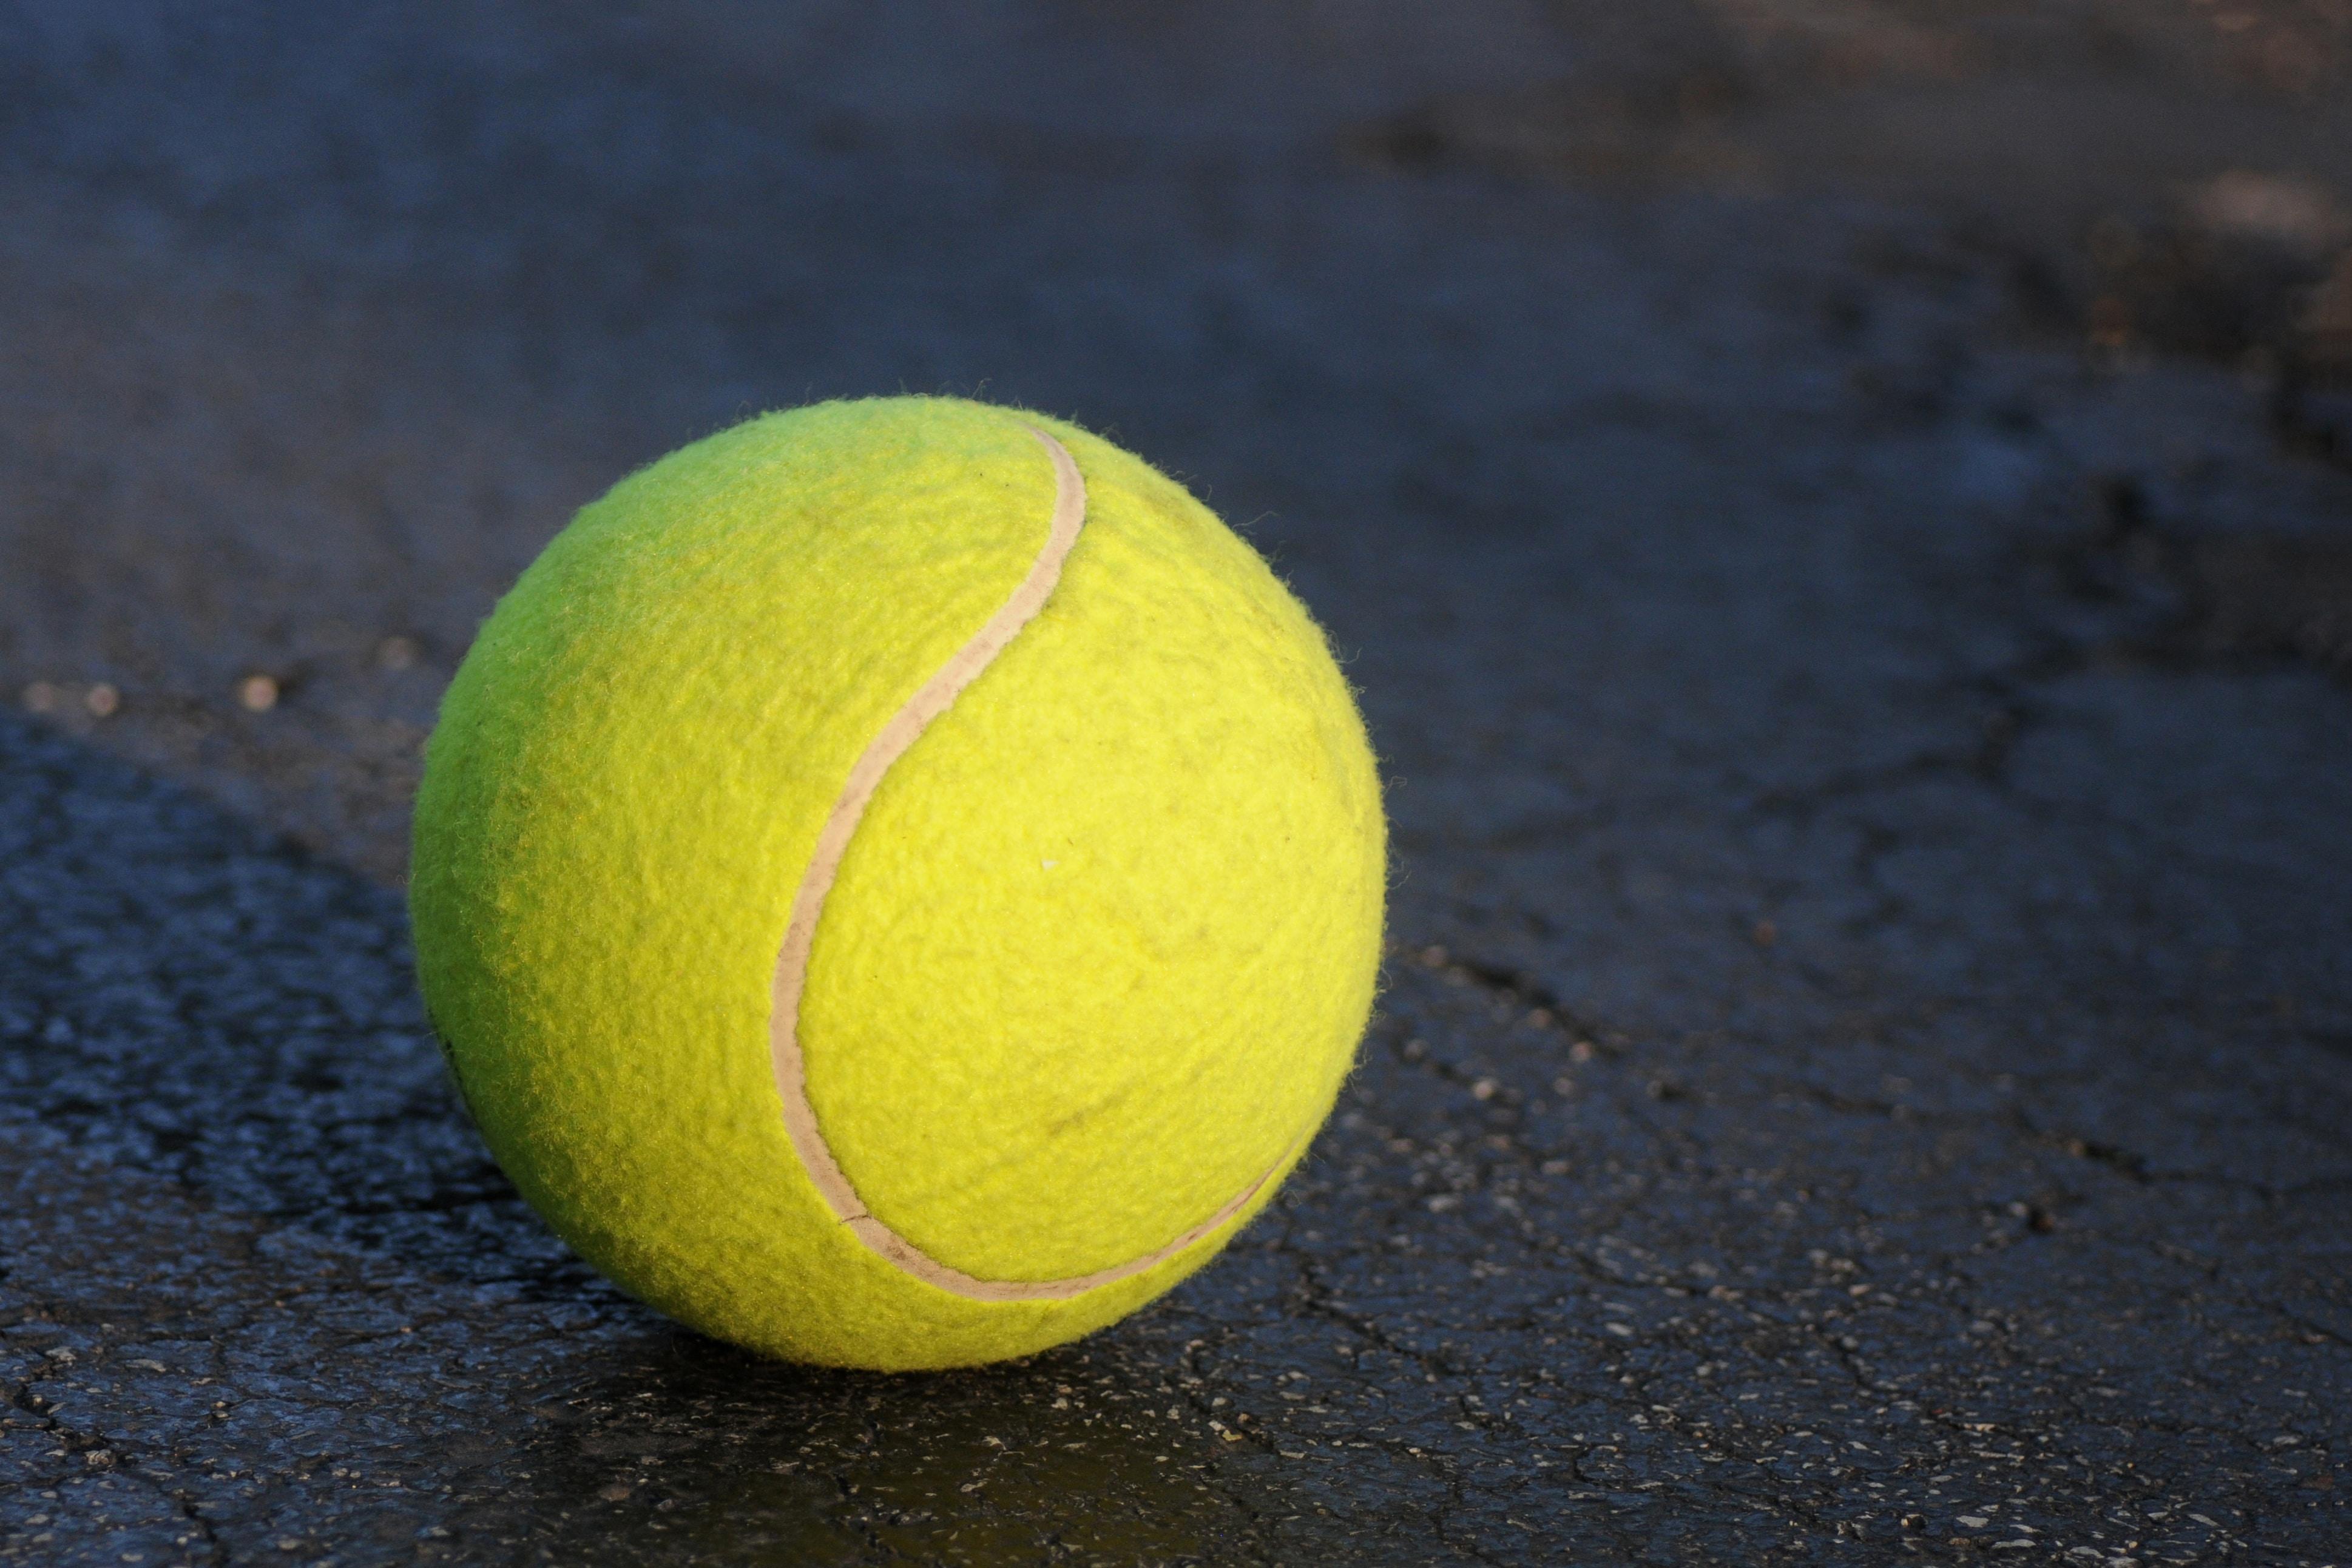 shallow focus photography of tennis ball